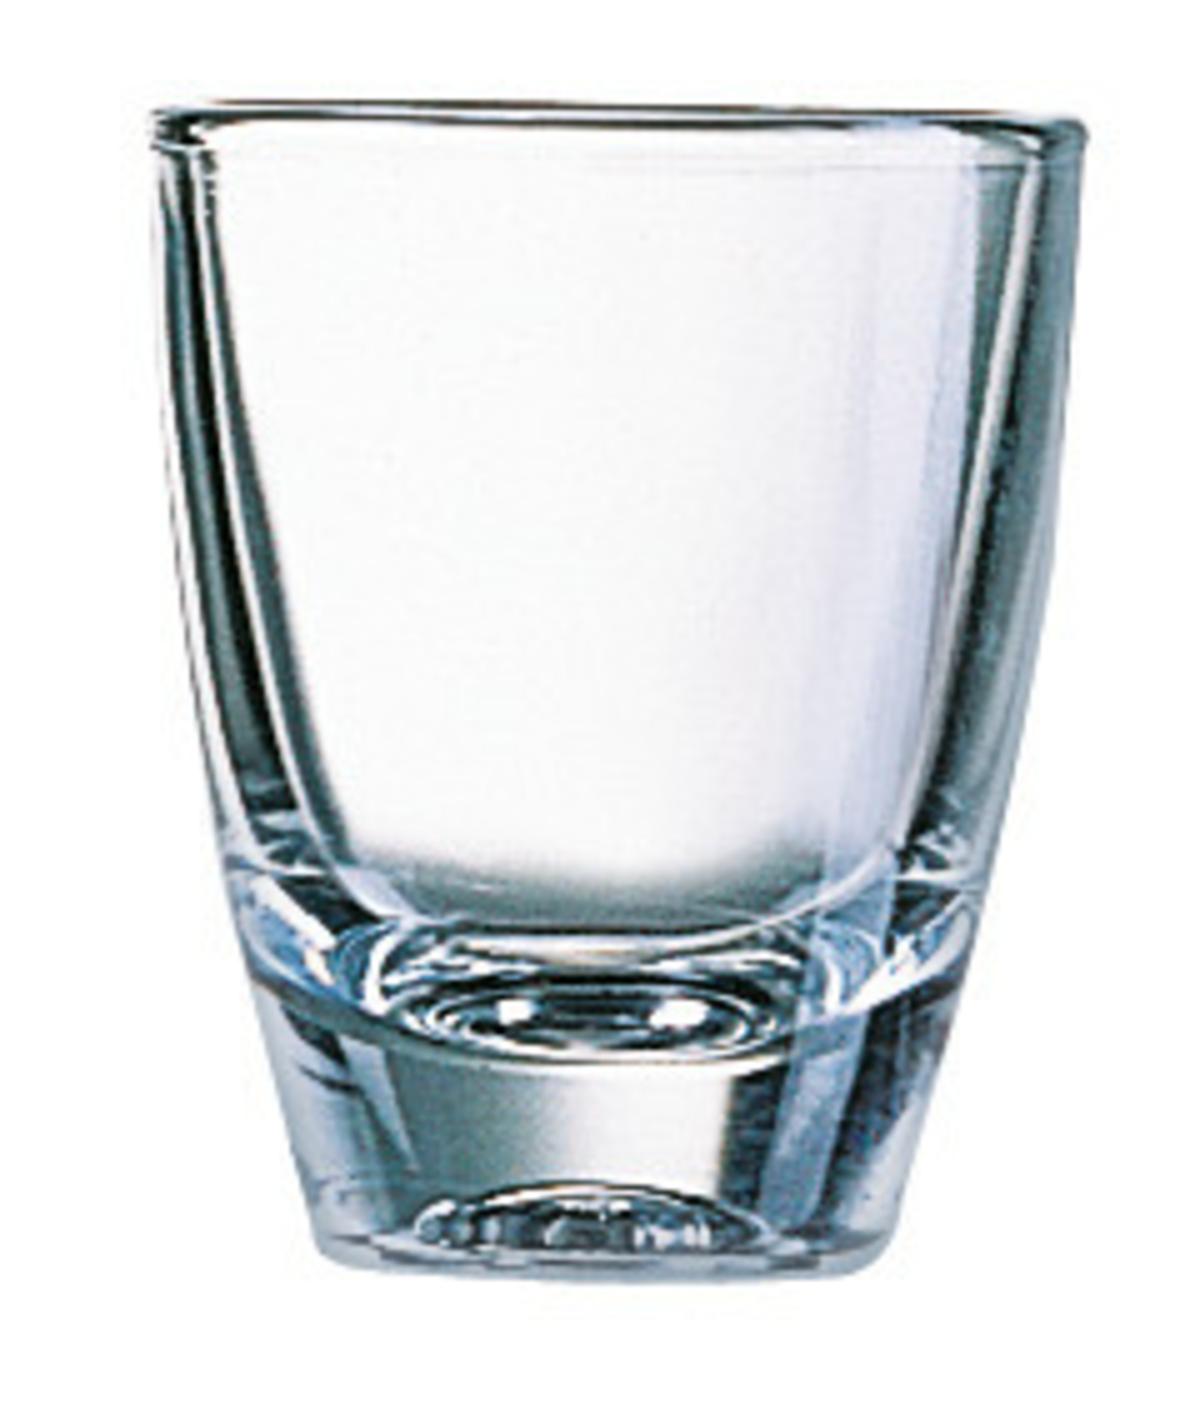 Verrine ronde transparente verre 3 cl Ø 4,20 cm Gin Arcoroc